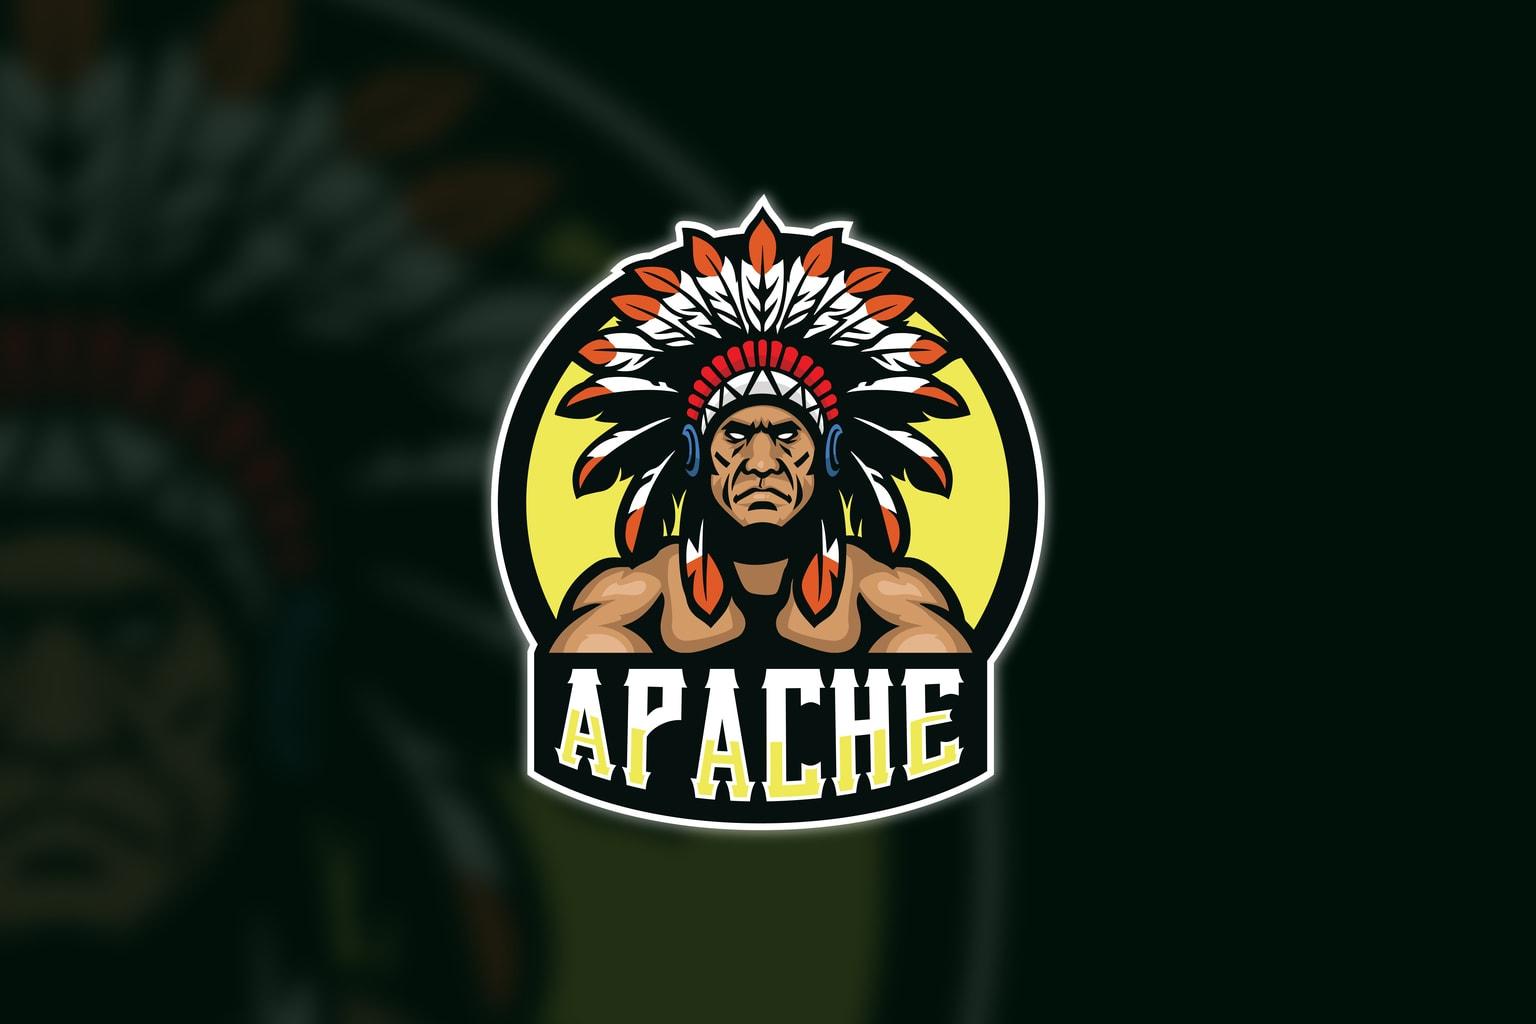 esport logo swarm of apache